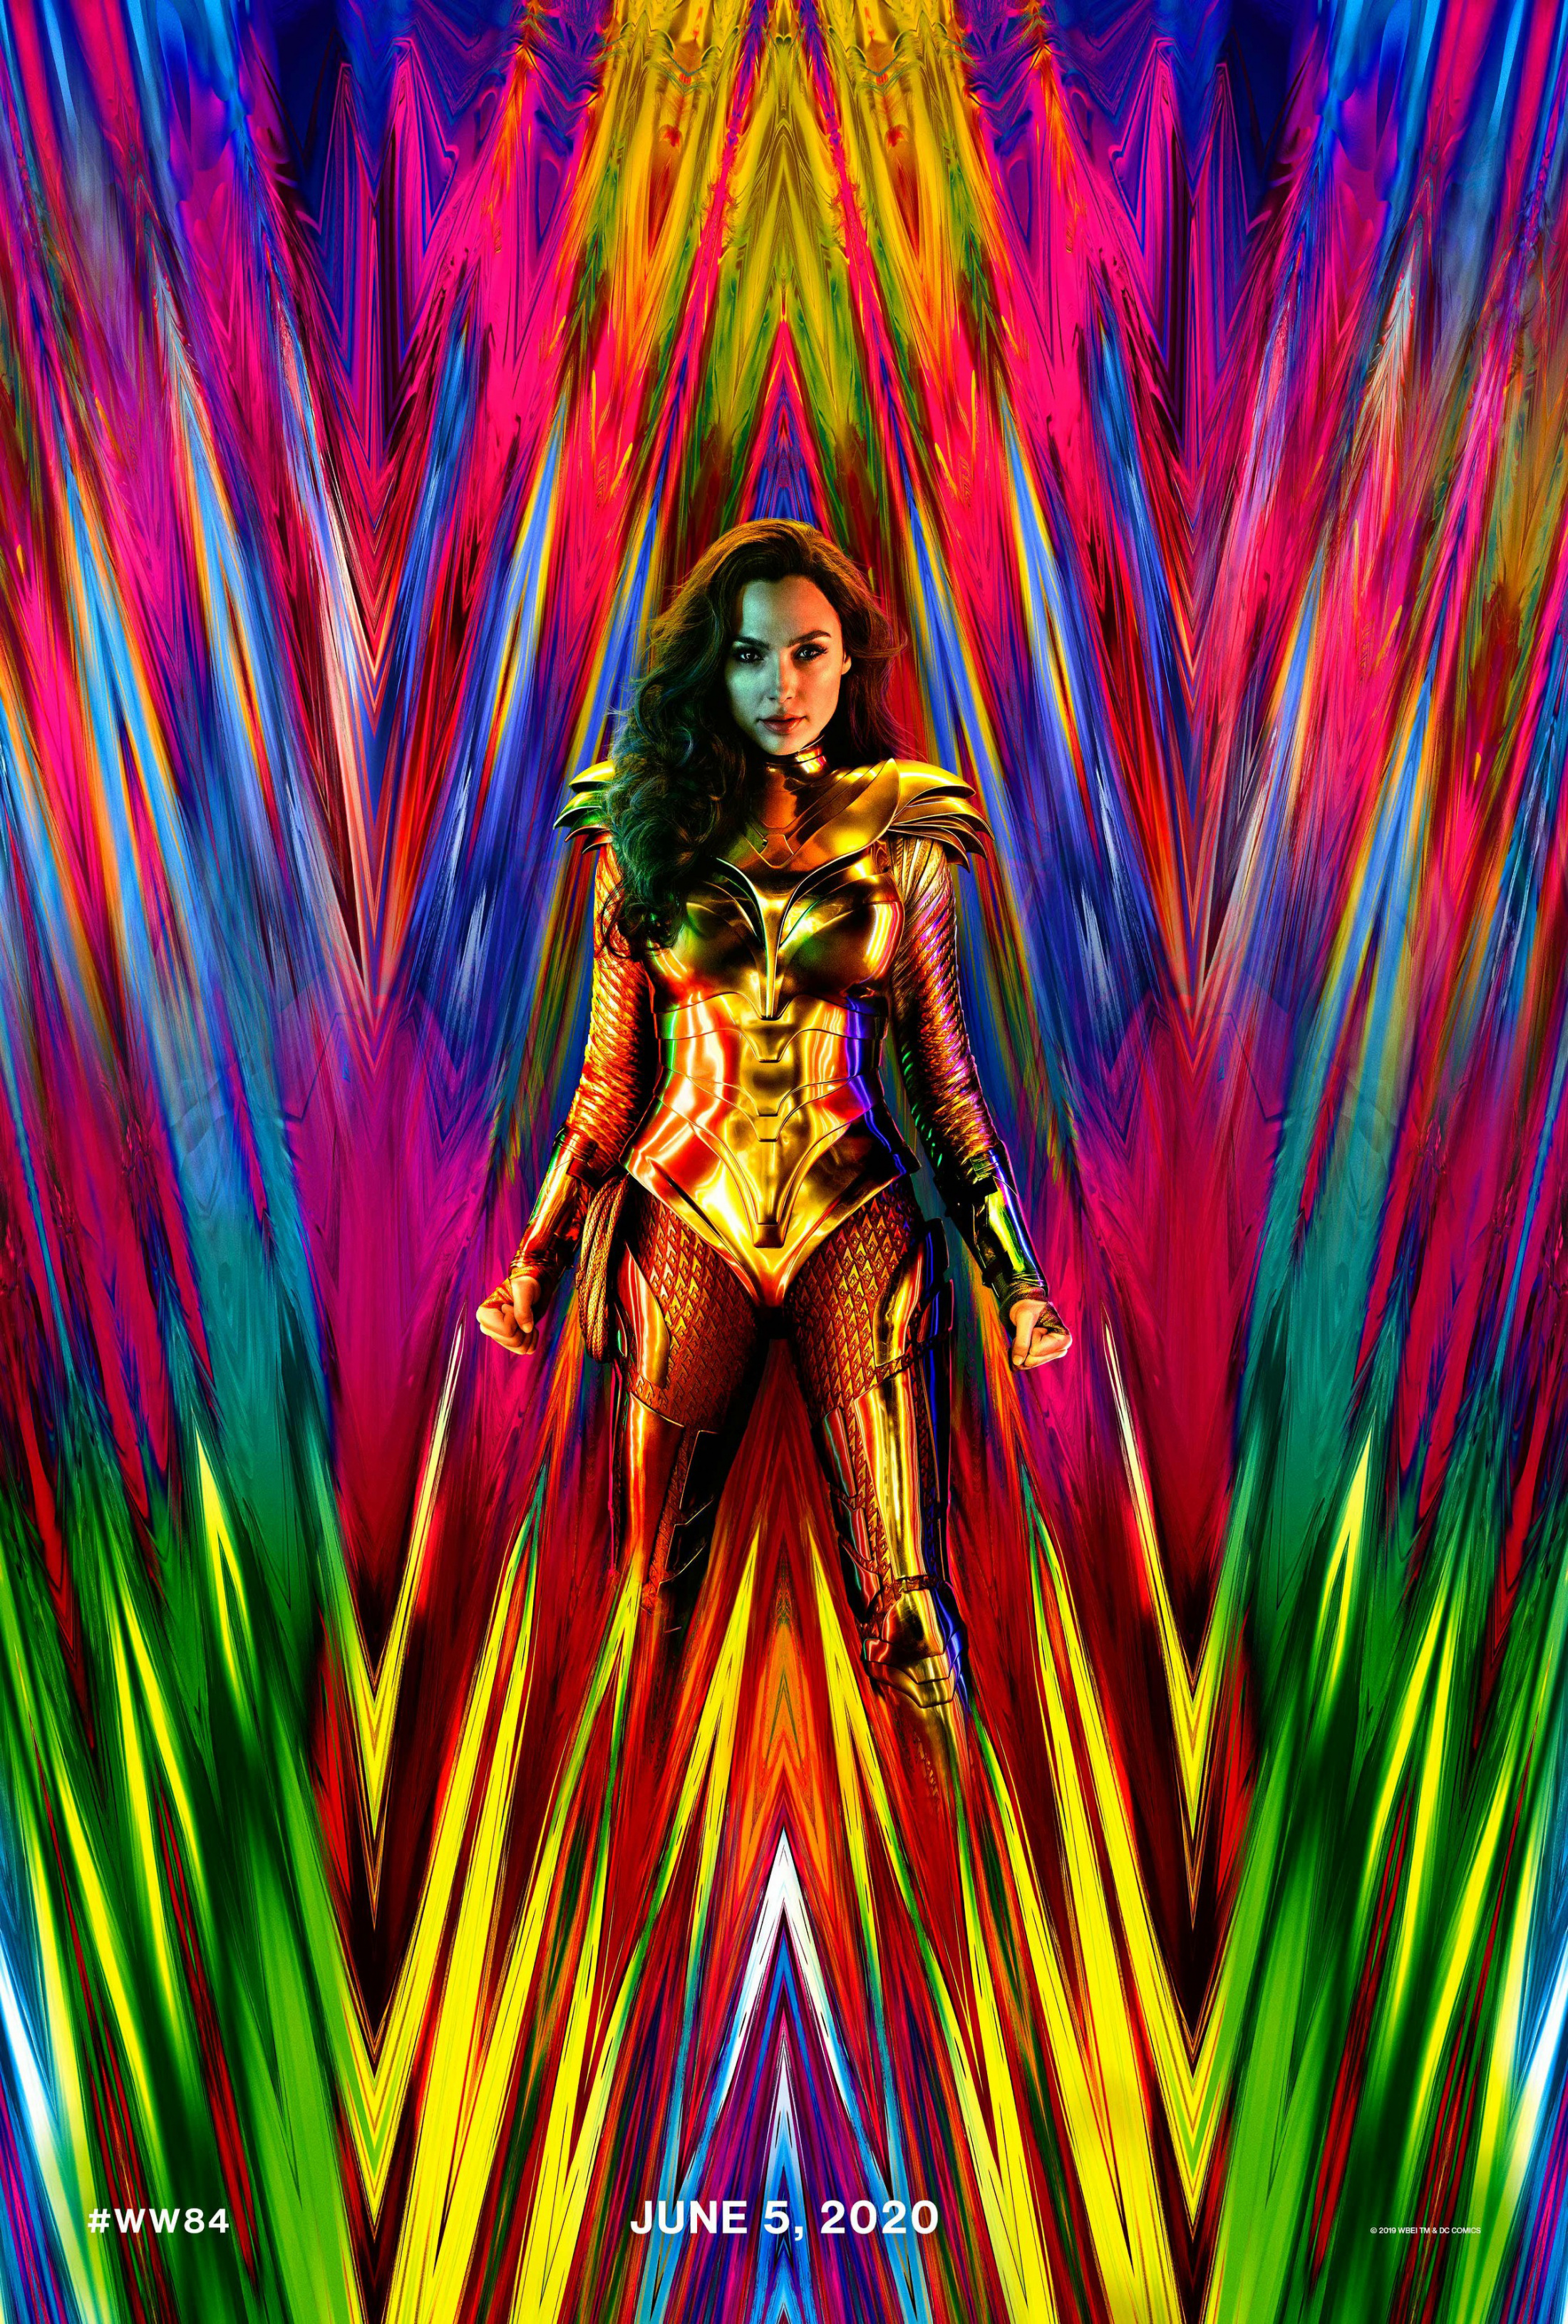 Thumbnail for Wonder Woman 1984 Teaser